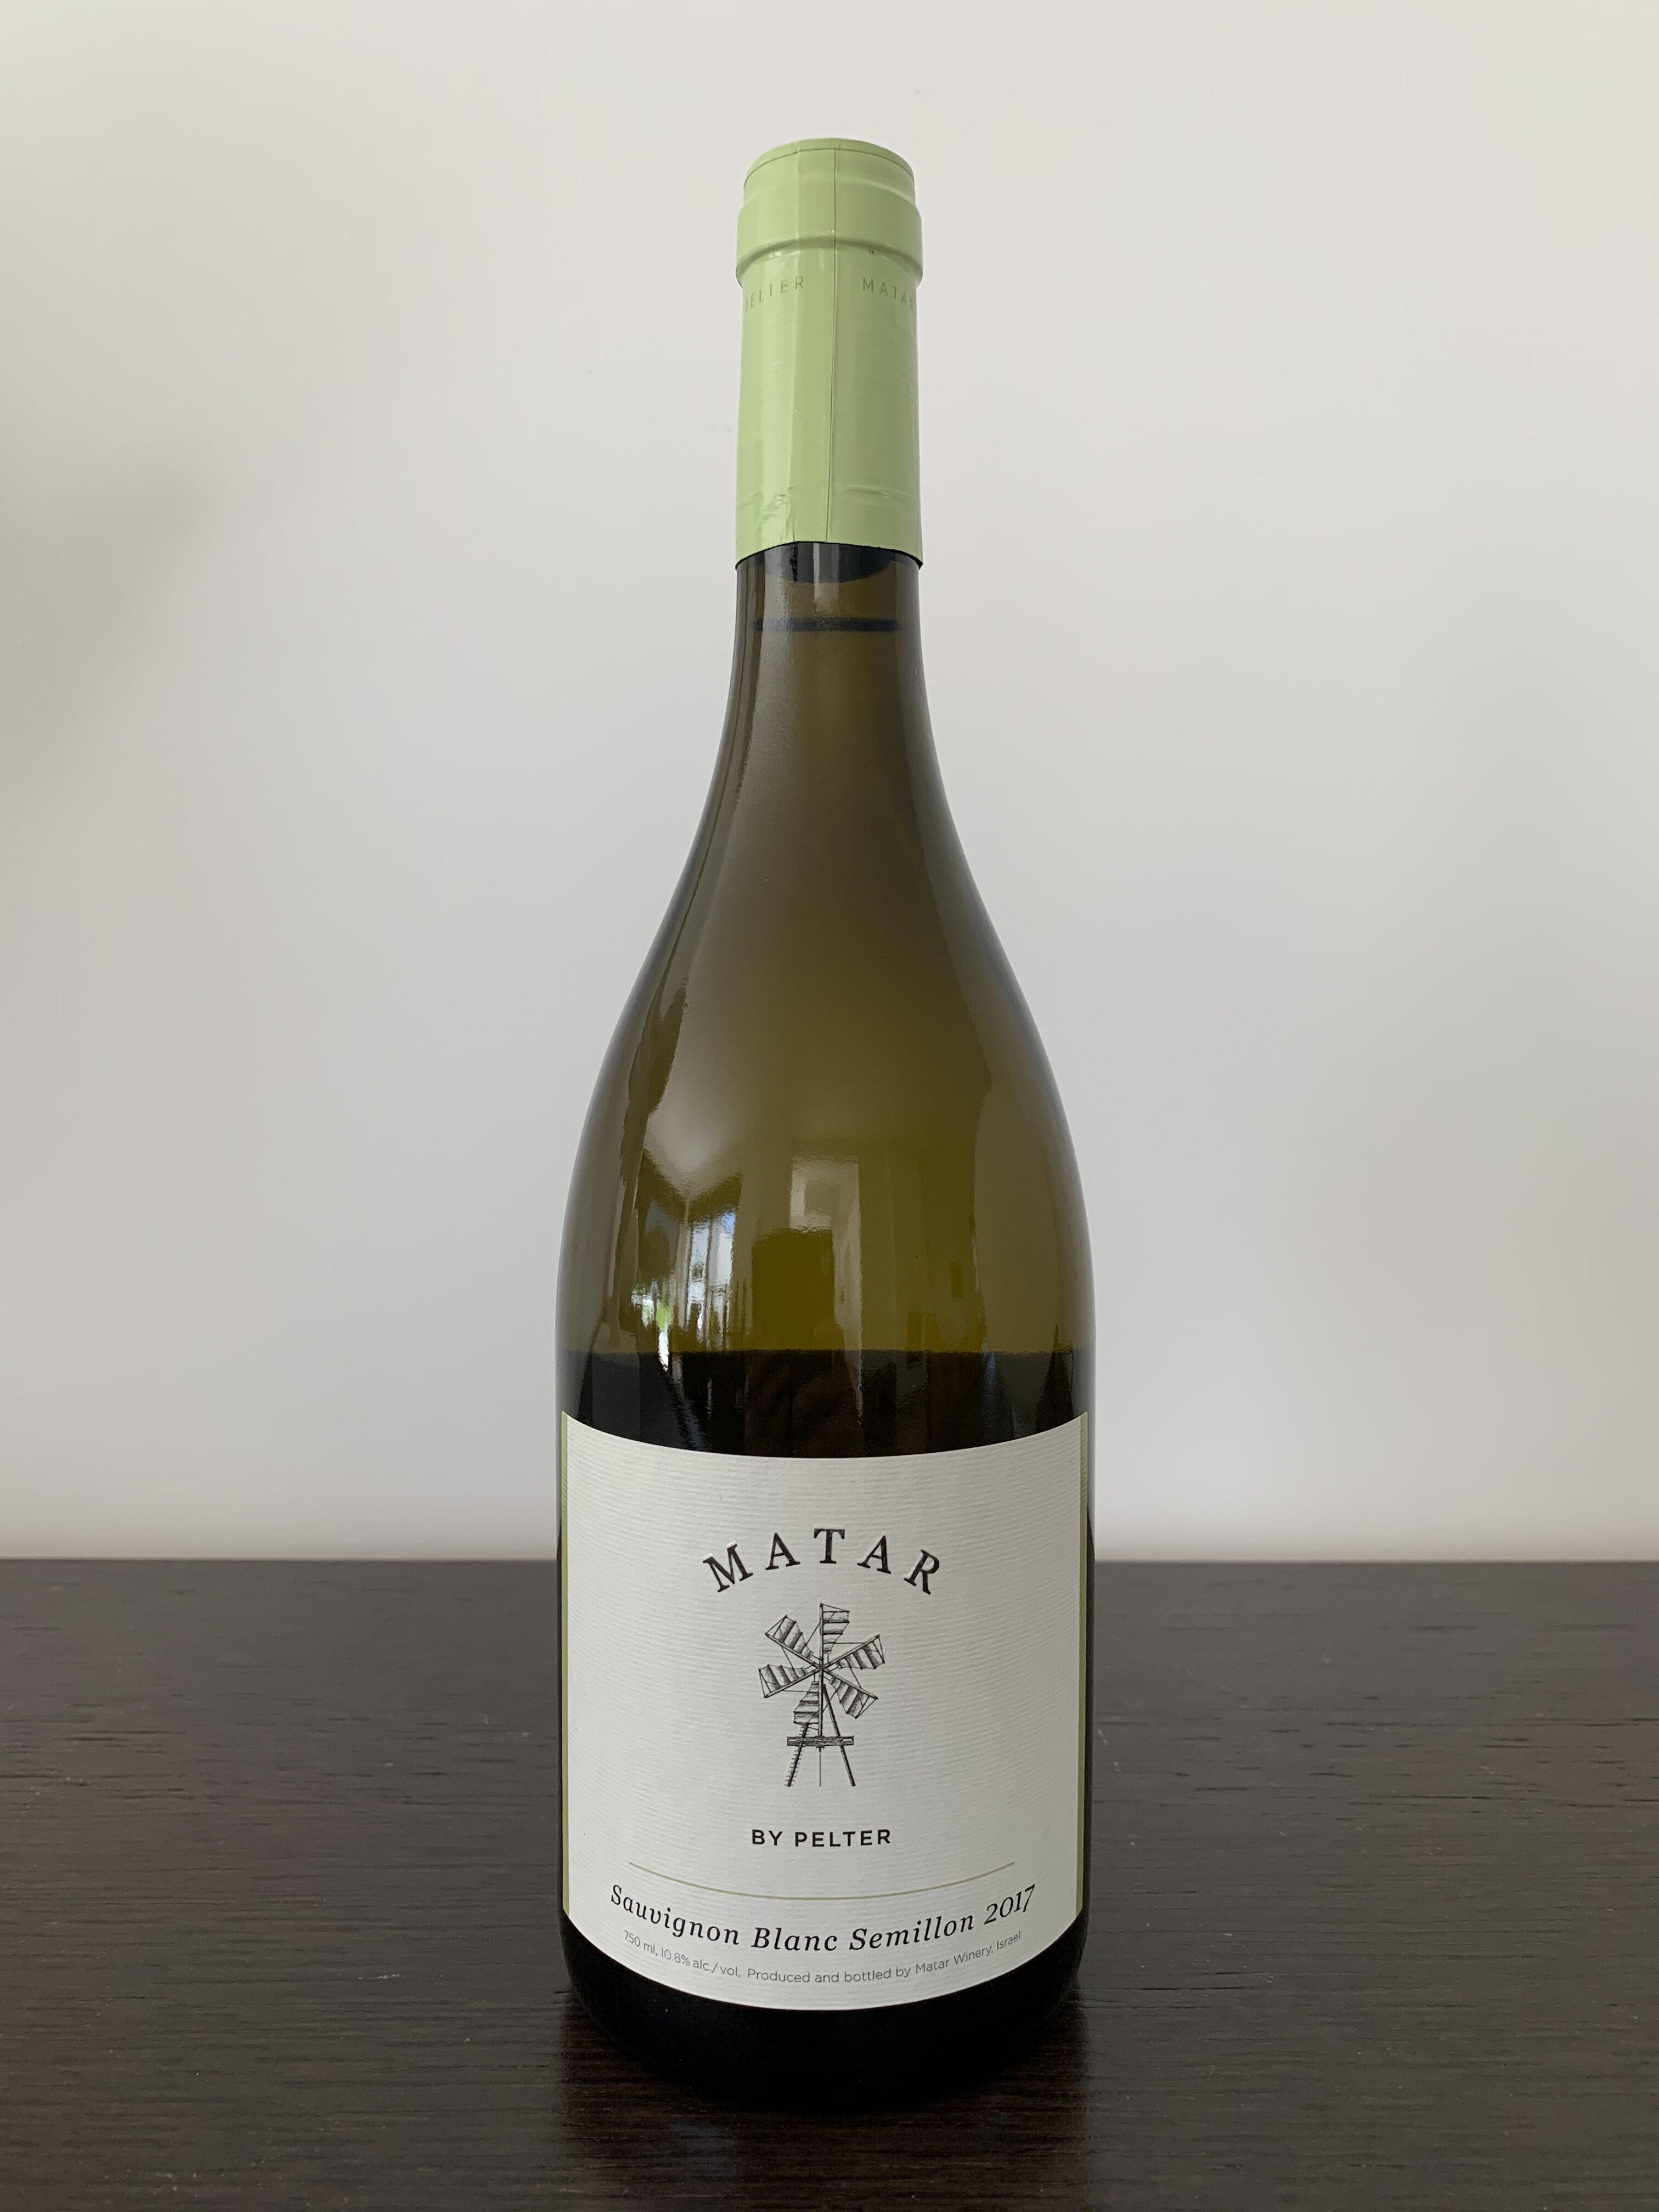 Pelter Sauvignon Blanc Semillon